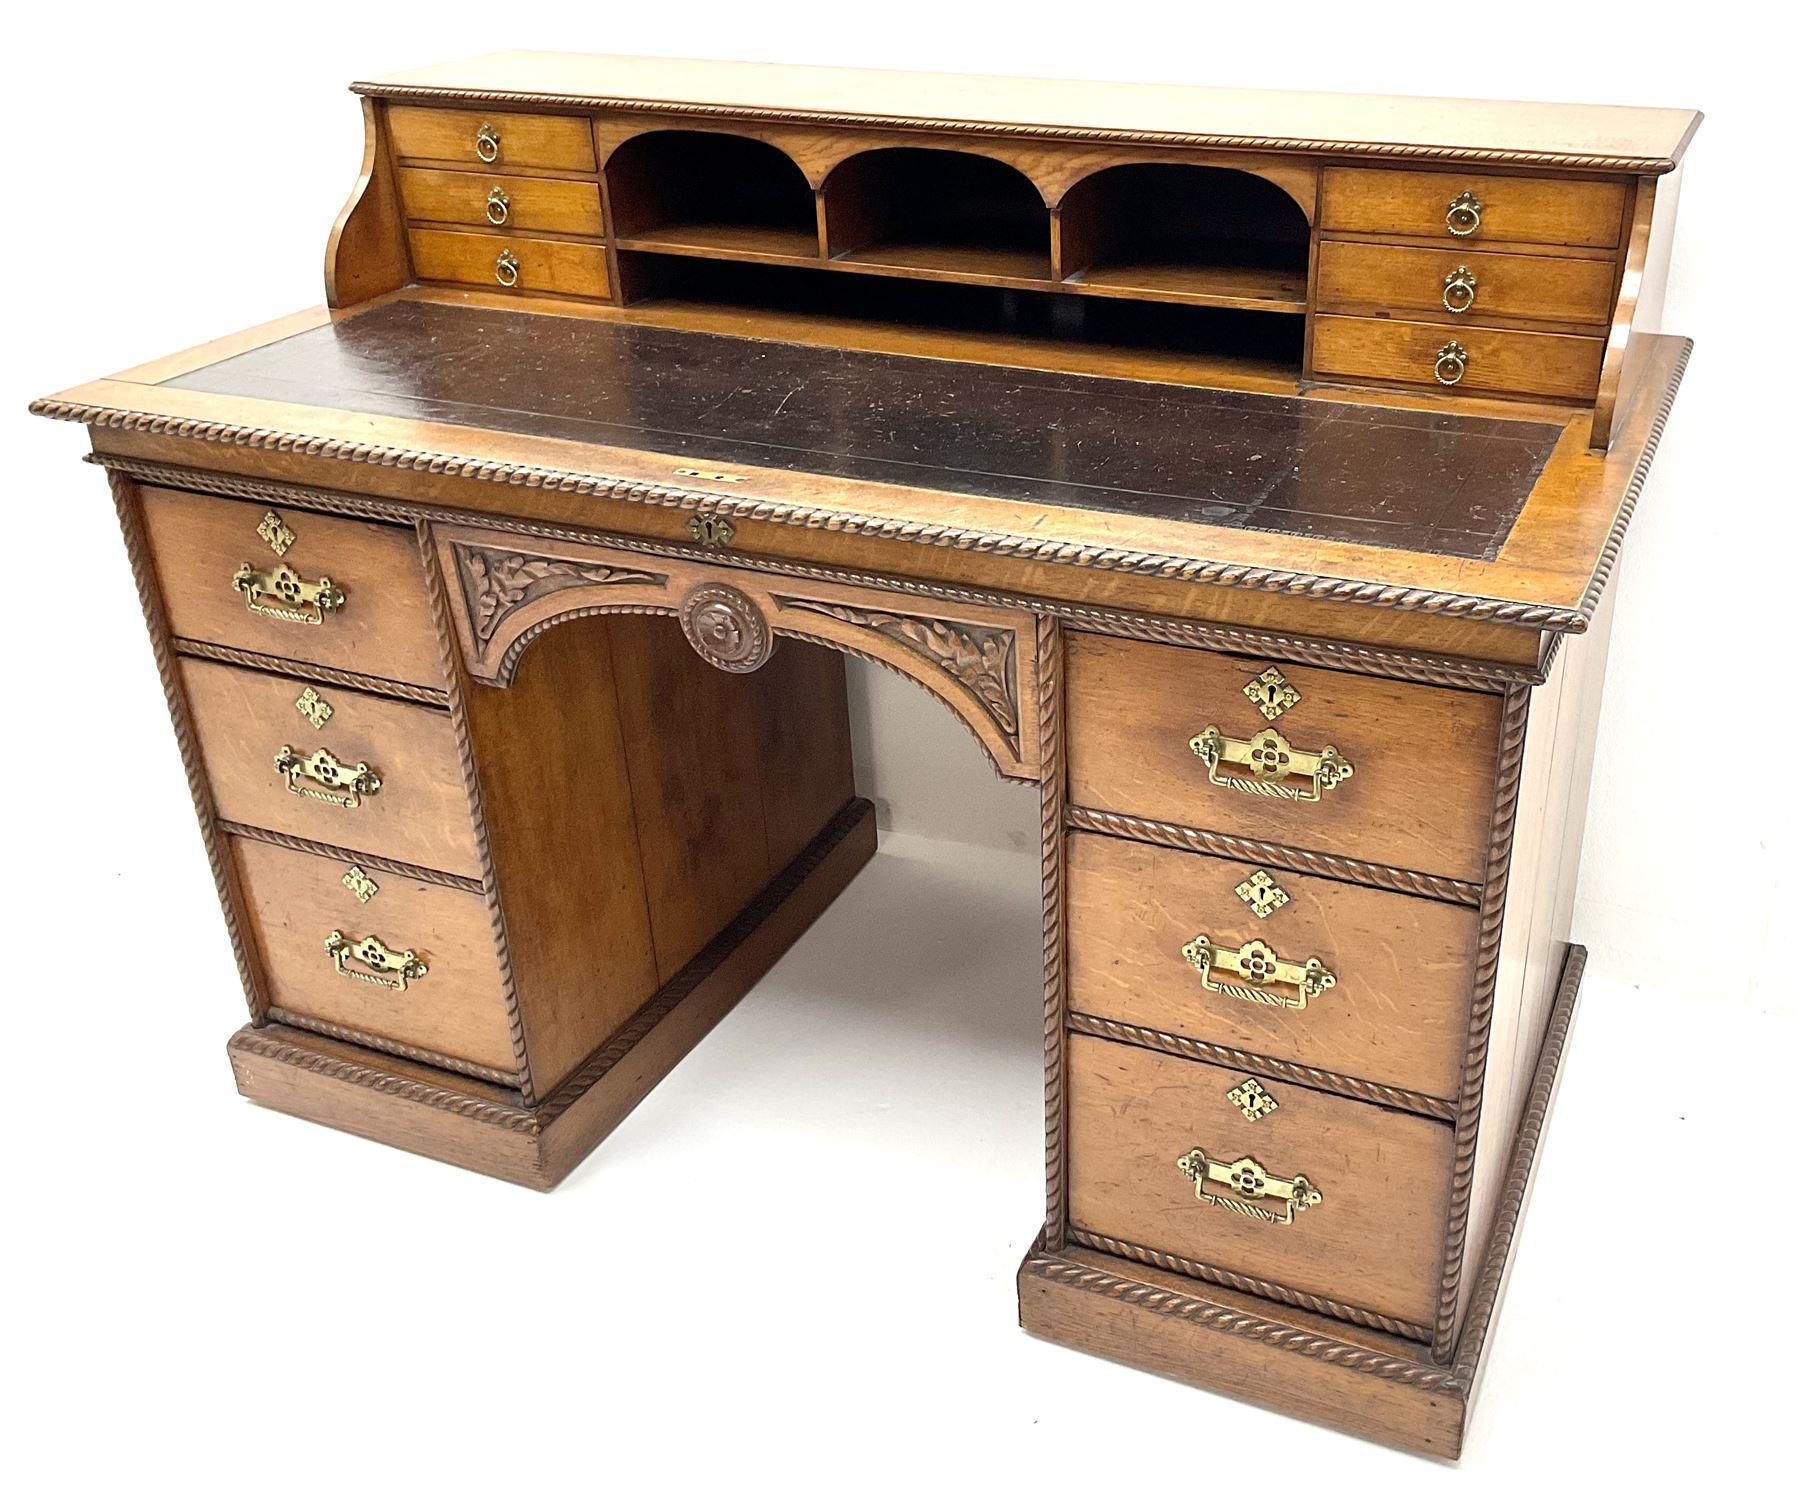 Victorian aesthetic oak movement desk - Image 7 of 7